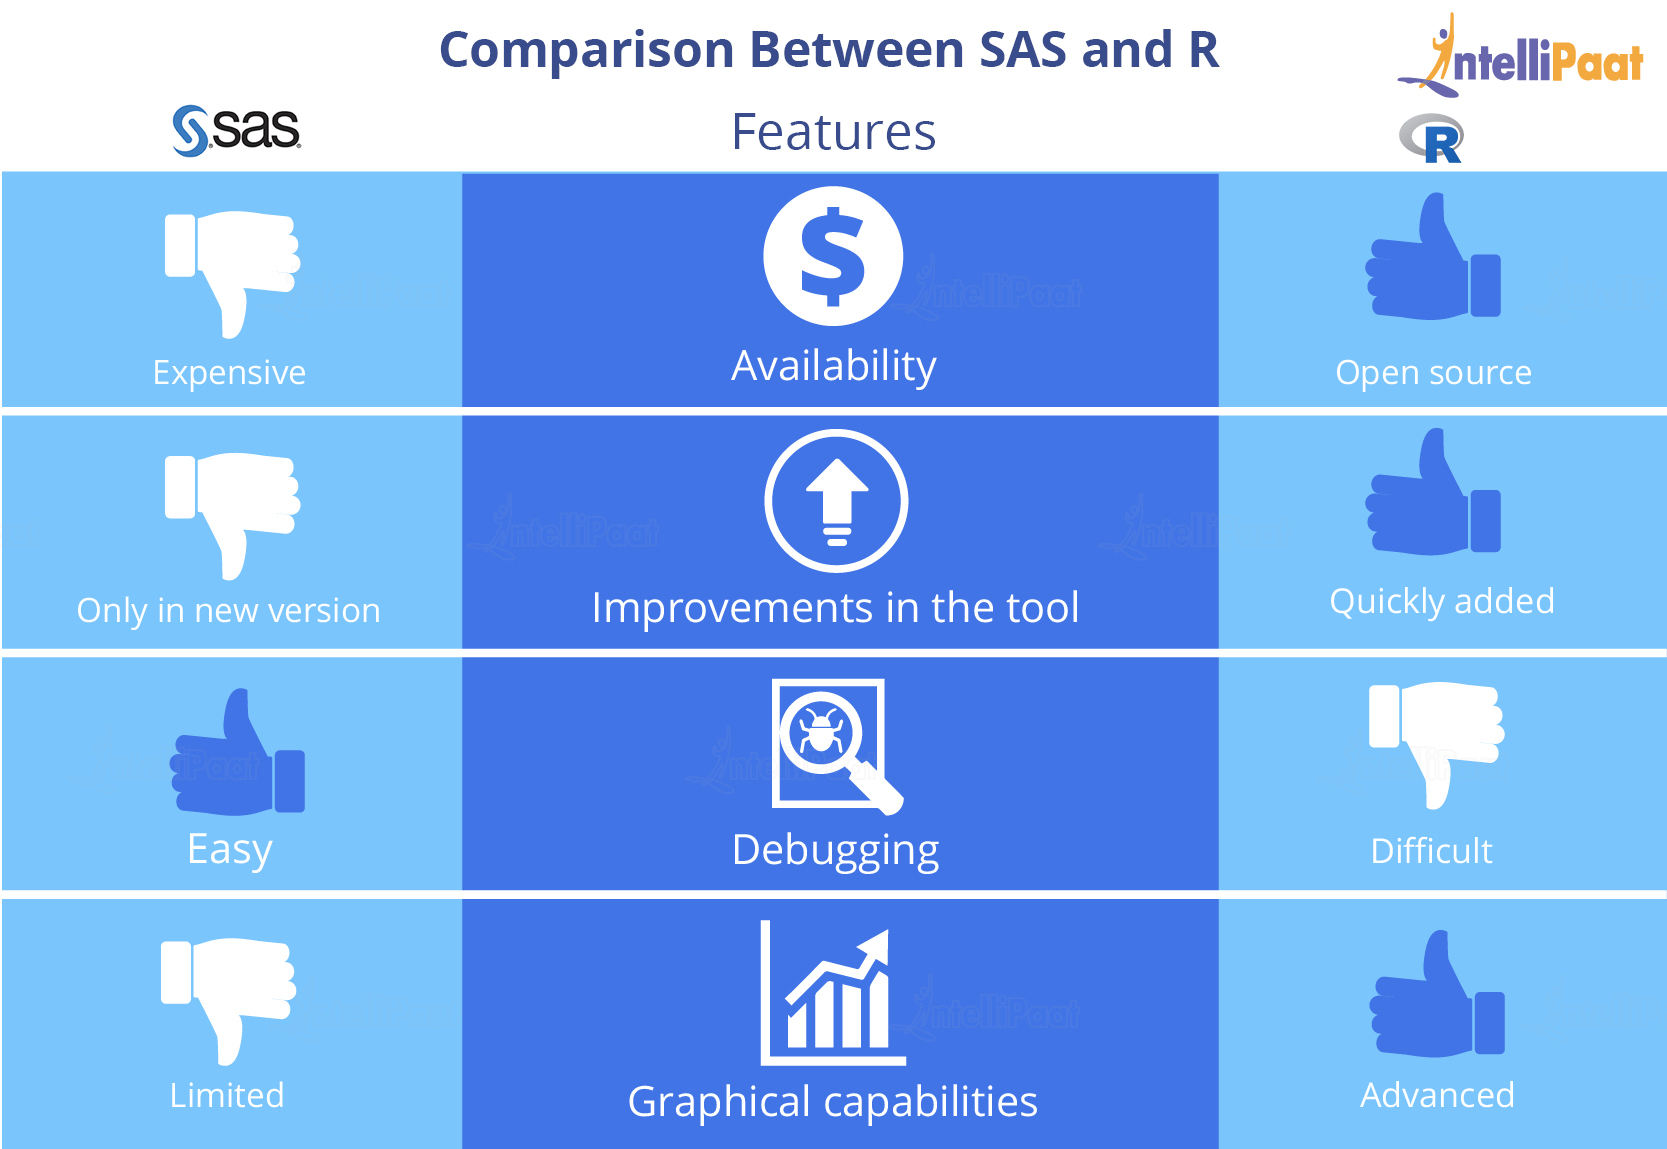 SAS R Comparison